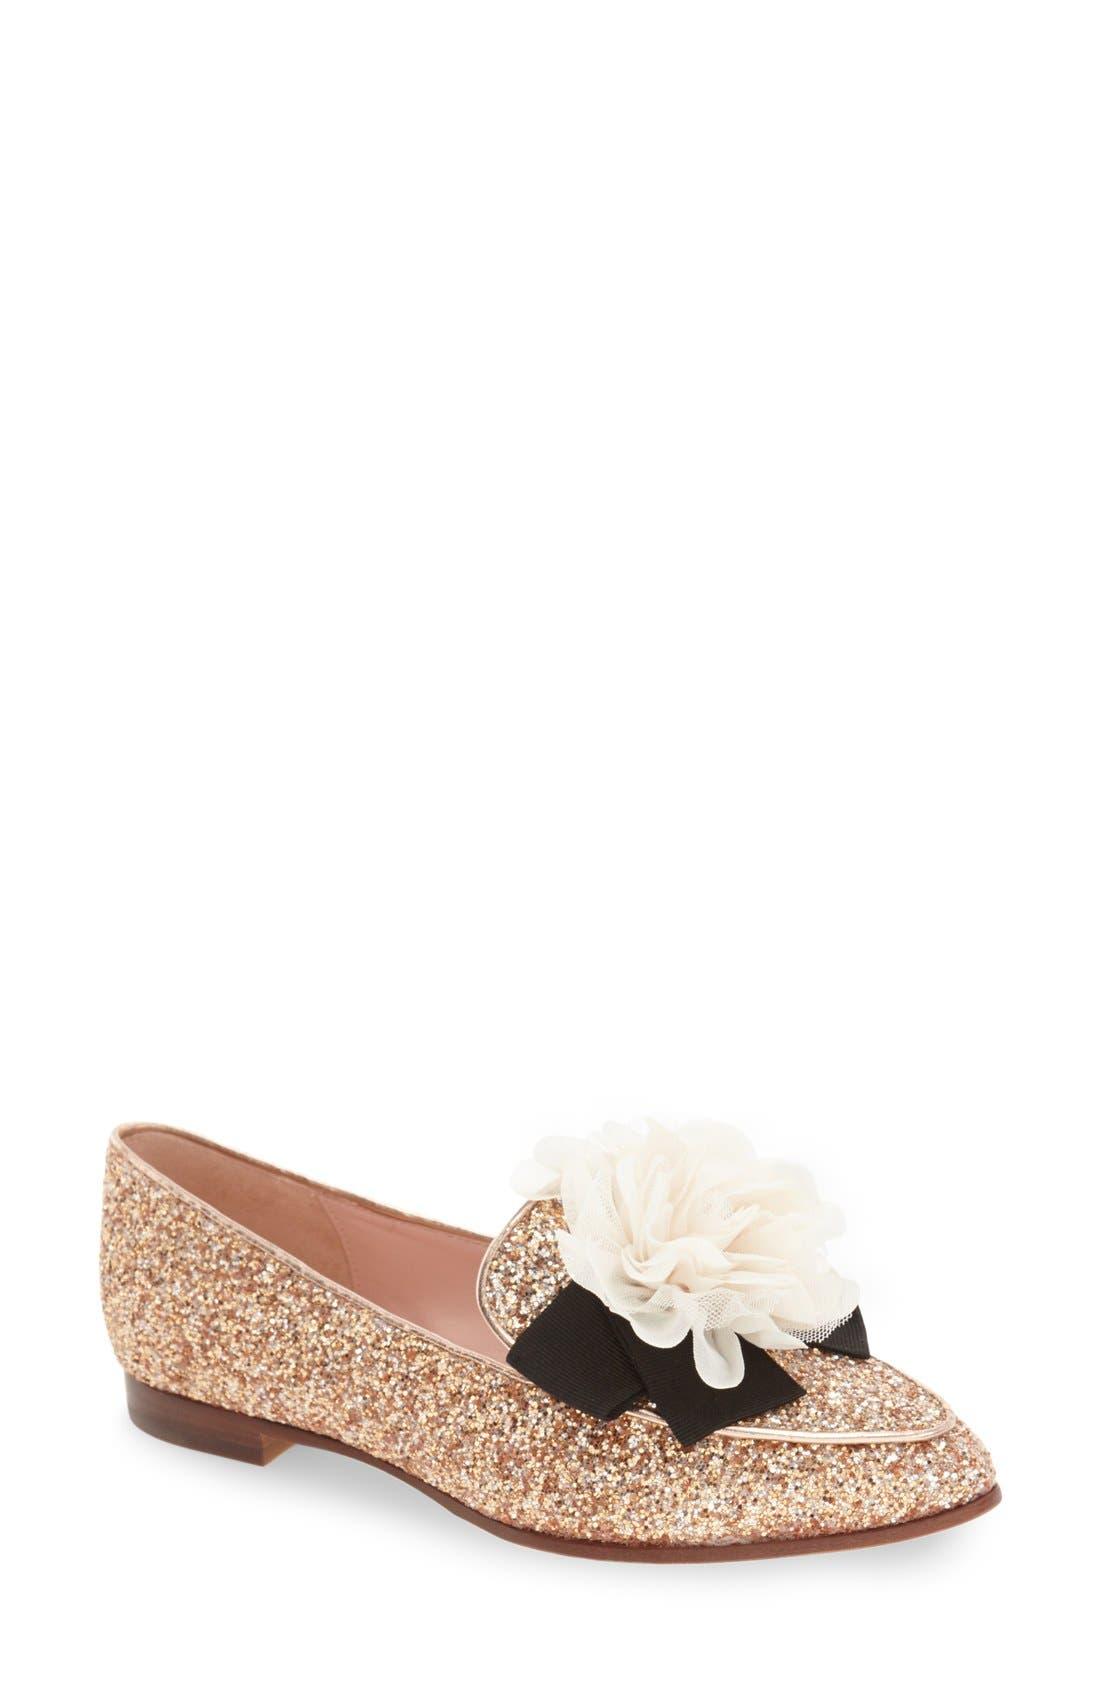 Main Image - kate spade new york 'cinda' flower loafer (Women)